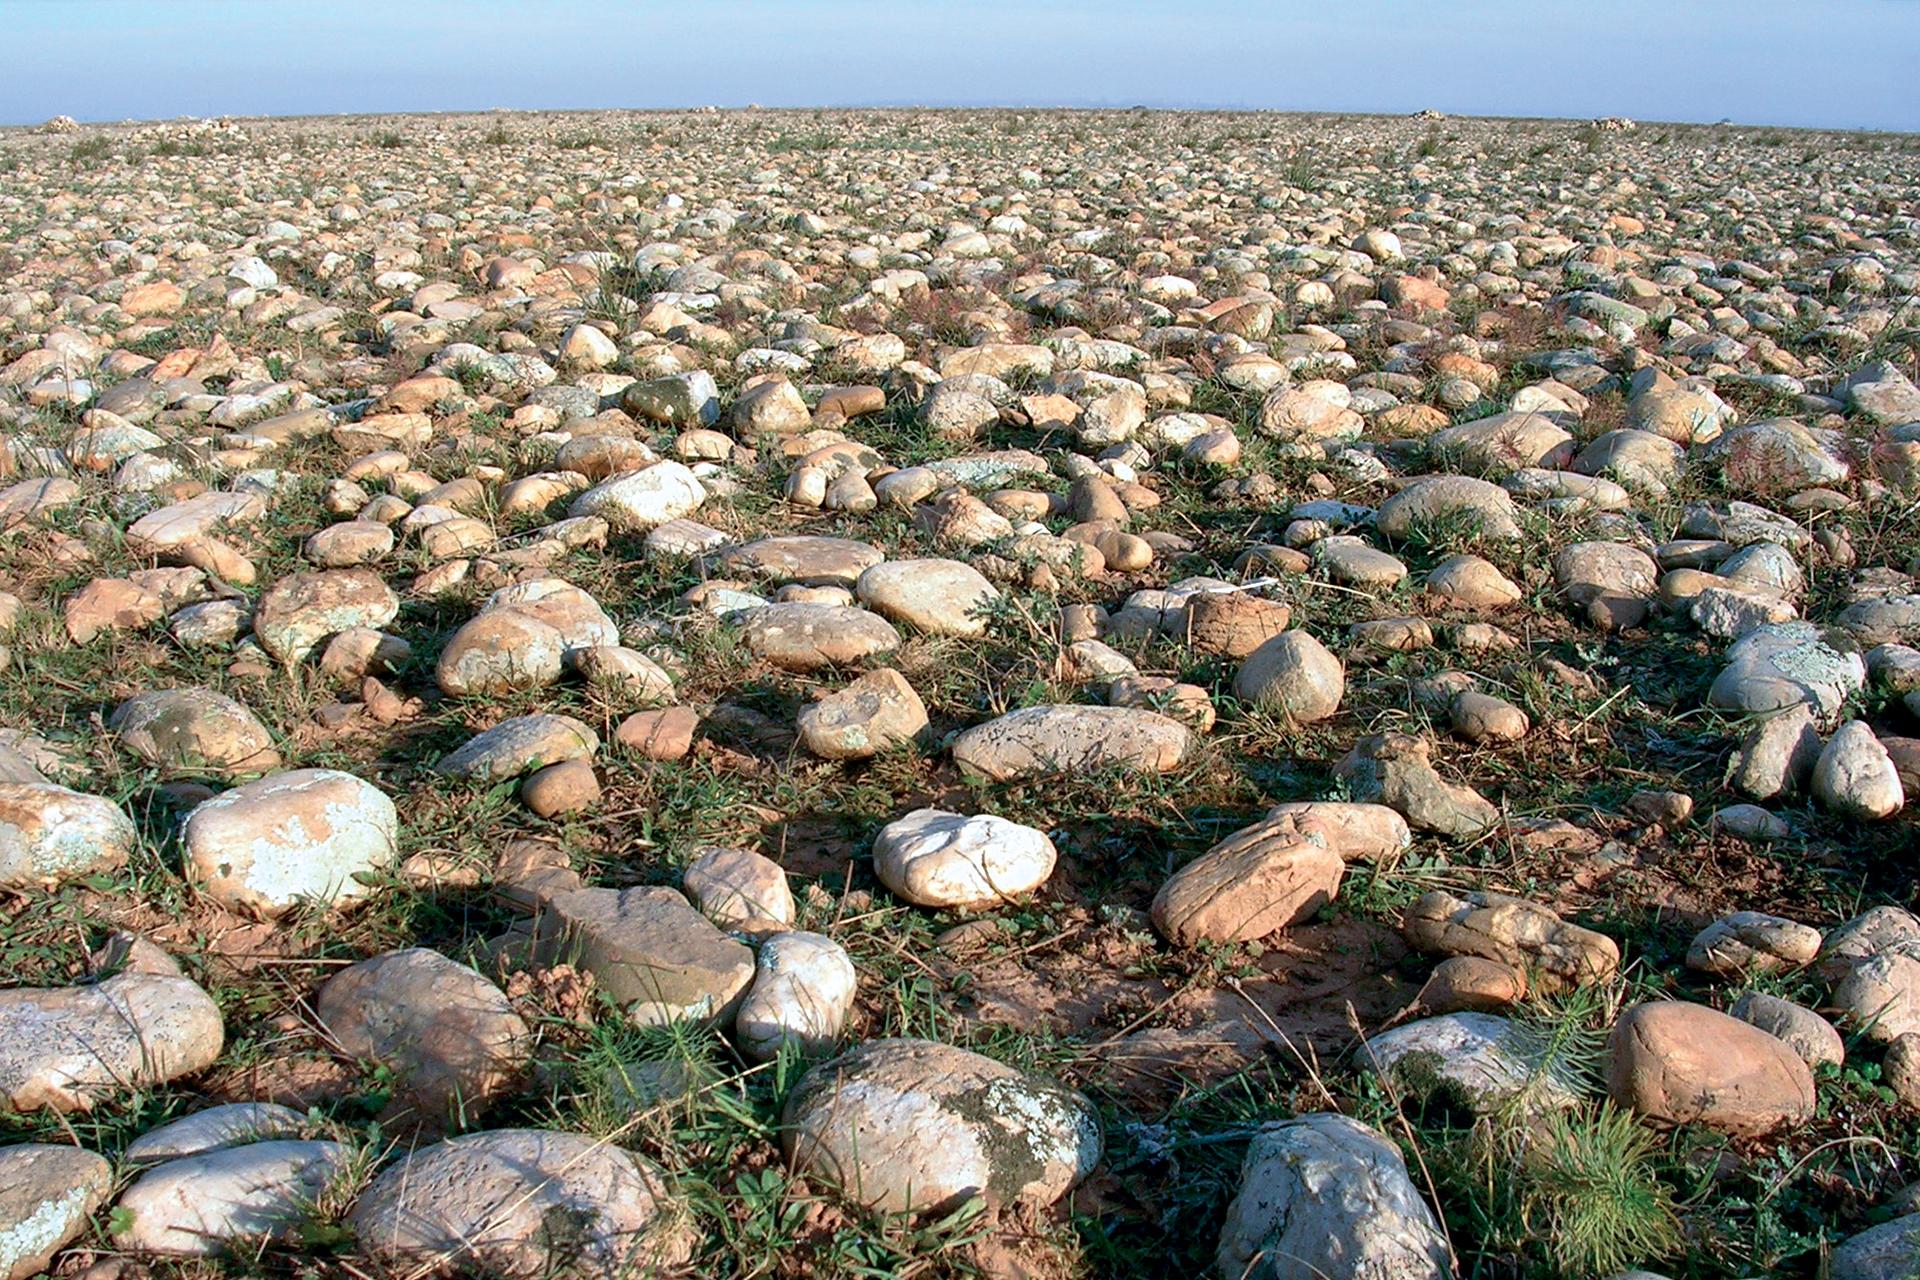 les galets de la Plaine de la Crau - © A.Woff